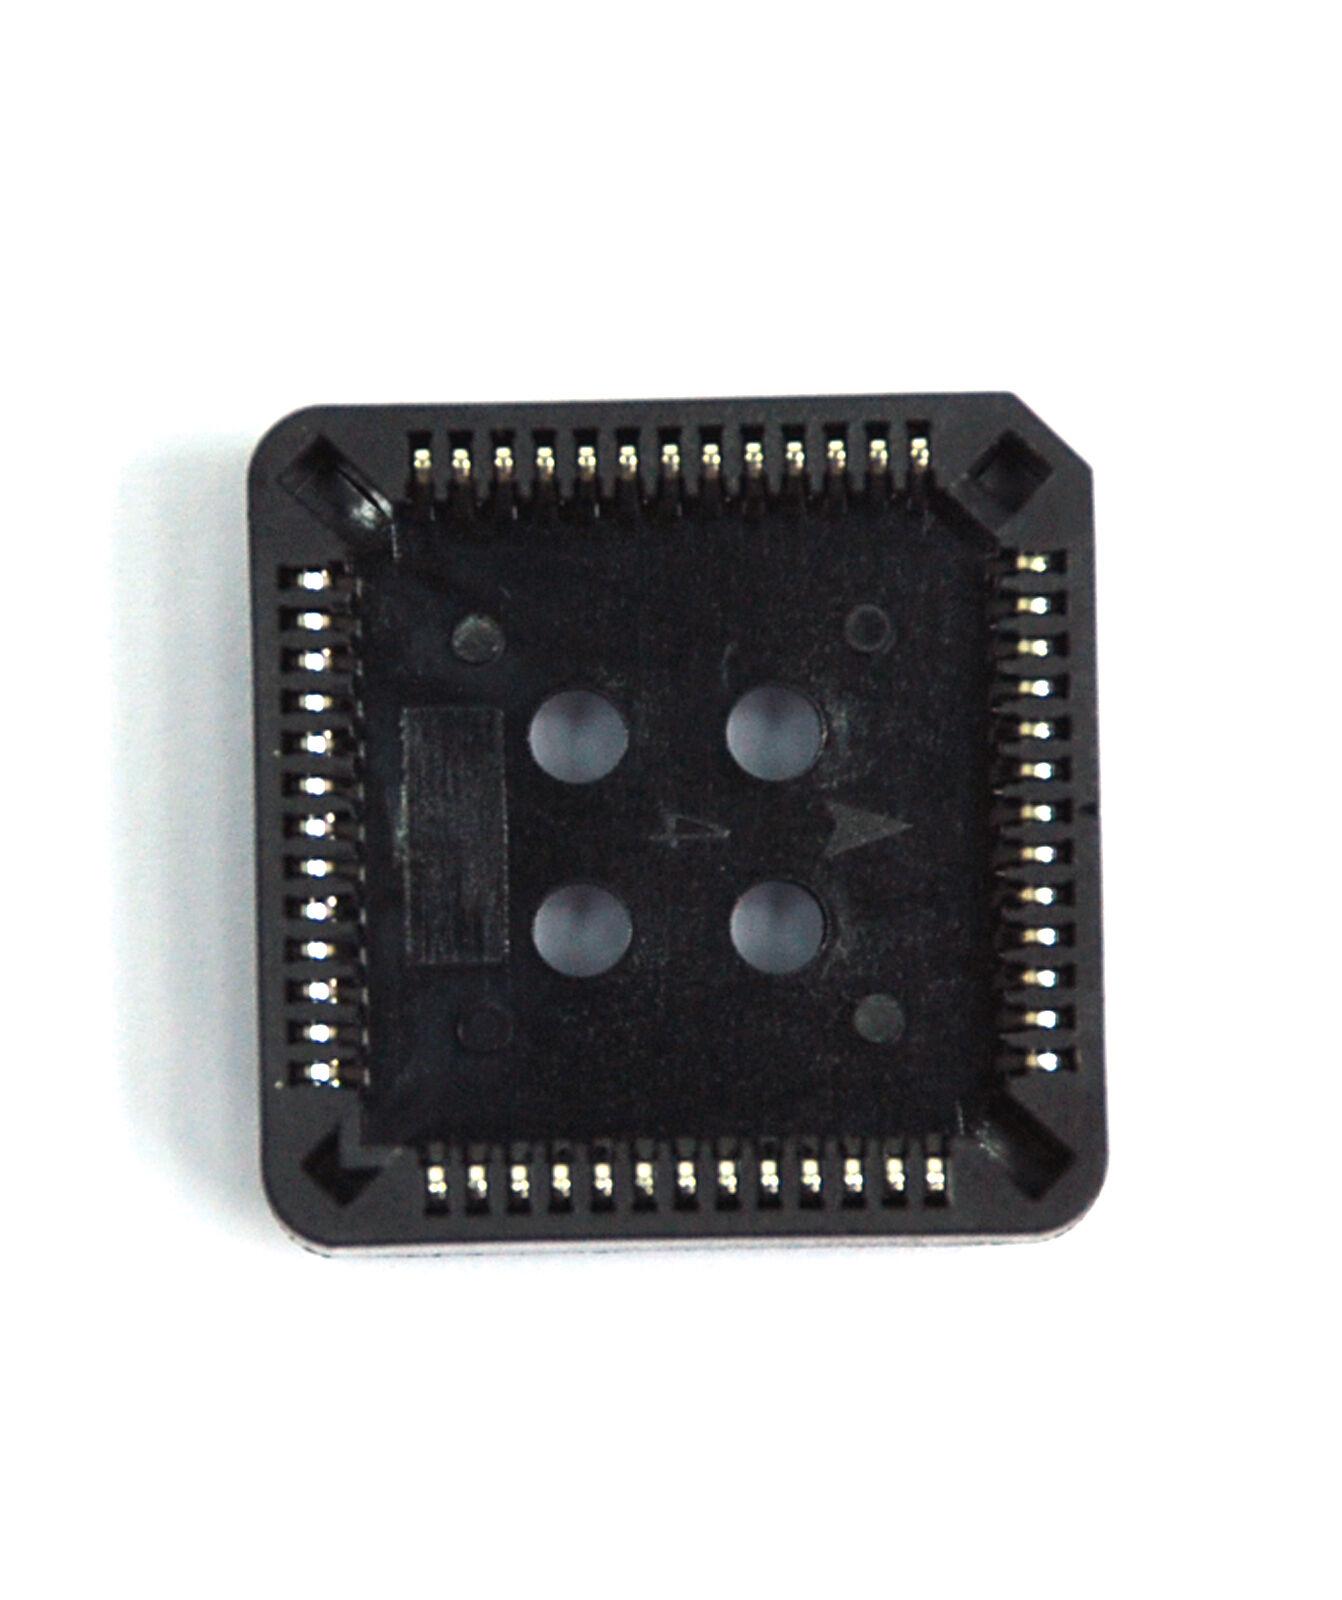 5pc PLCC DIP IC Socket 84P pitch= 1.27mm Tin plated RoHS Taiwan 260-84